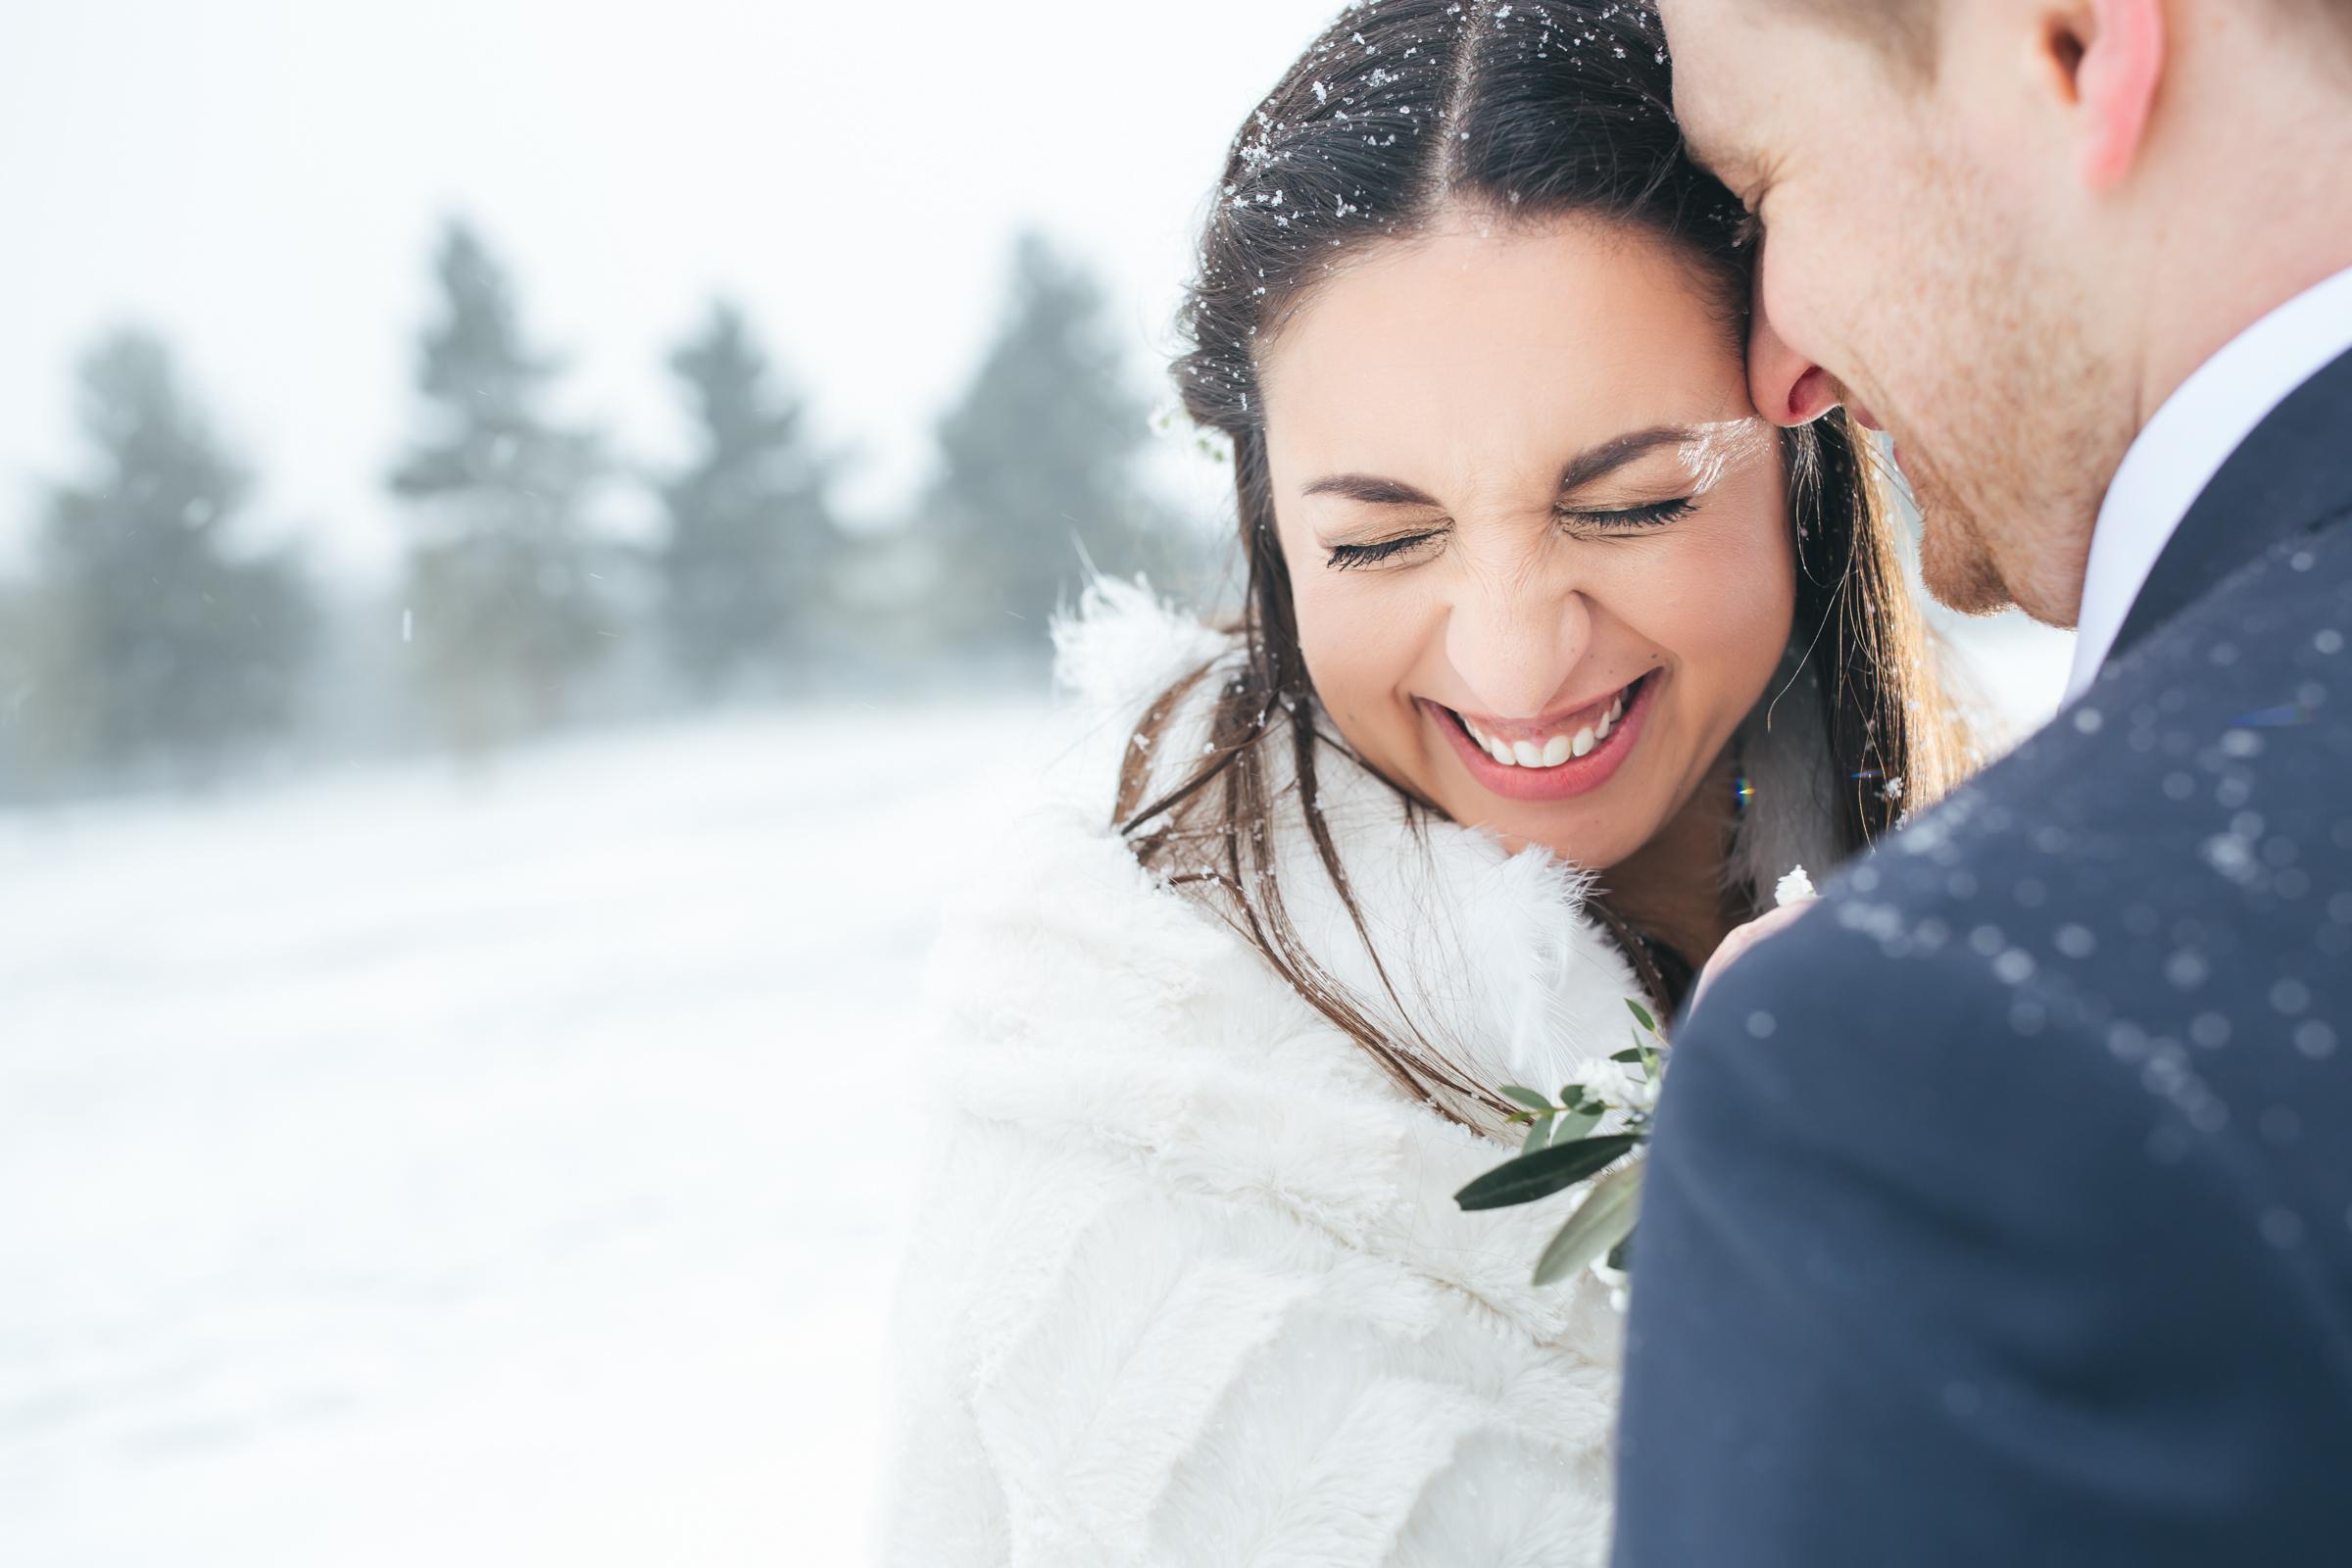 essendon country club snowy winter wedding hertford hertfordshire wedding photography rafe abrook photography-1011.jpg